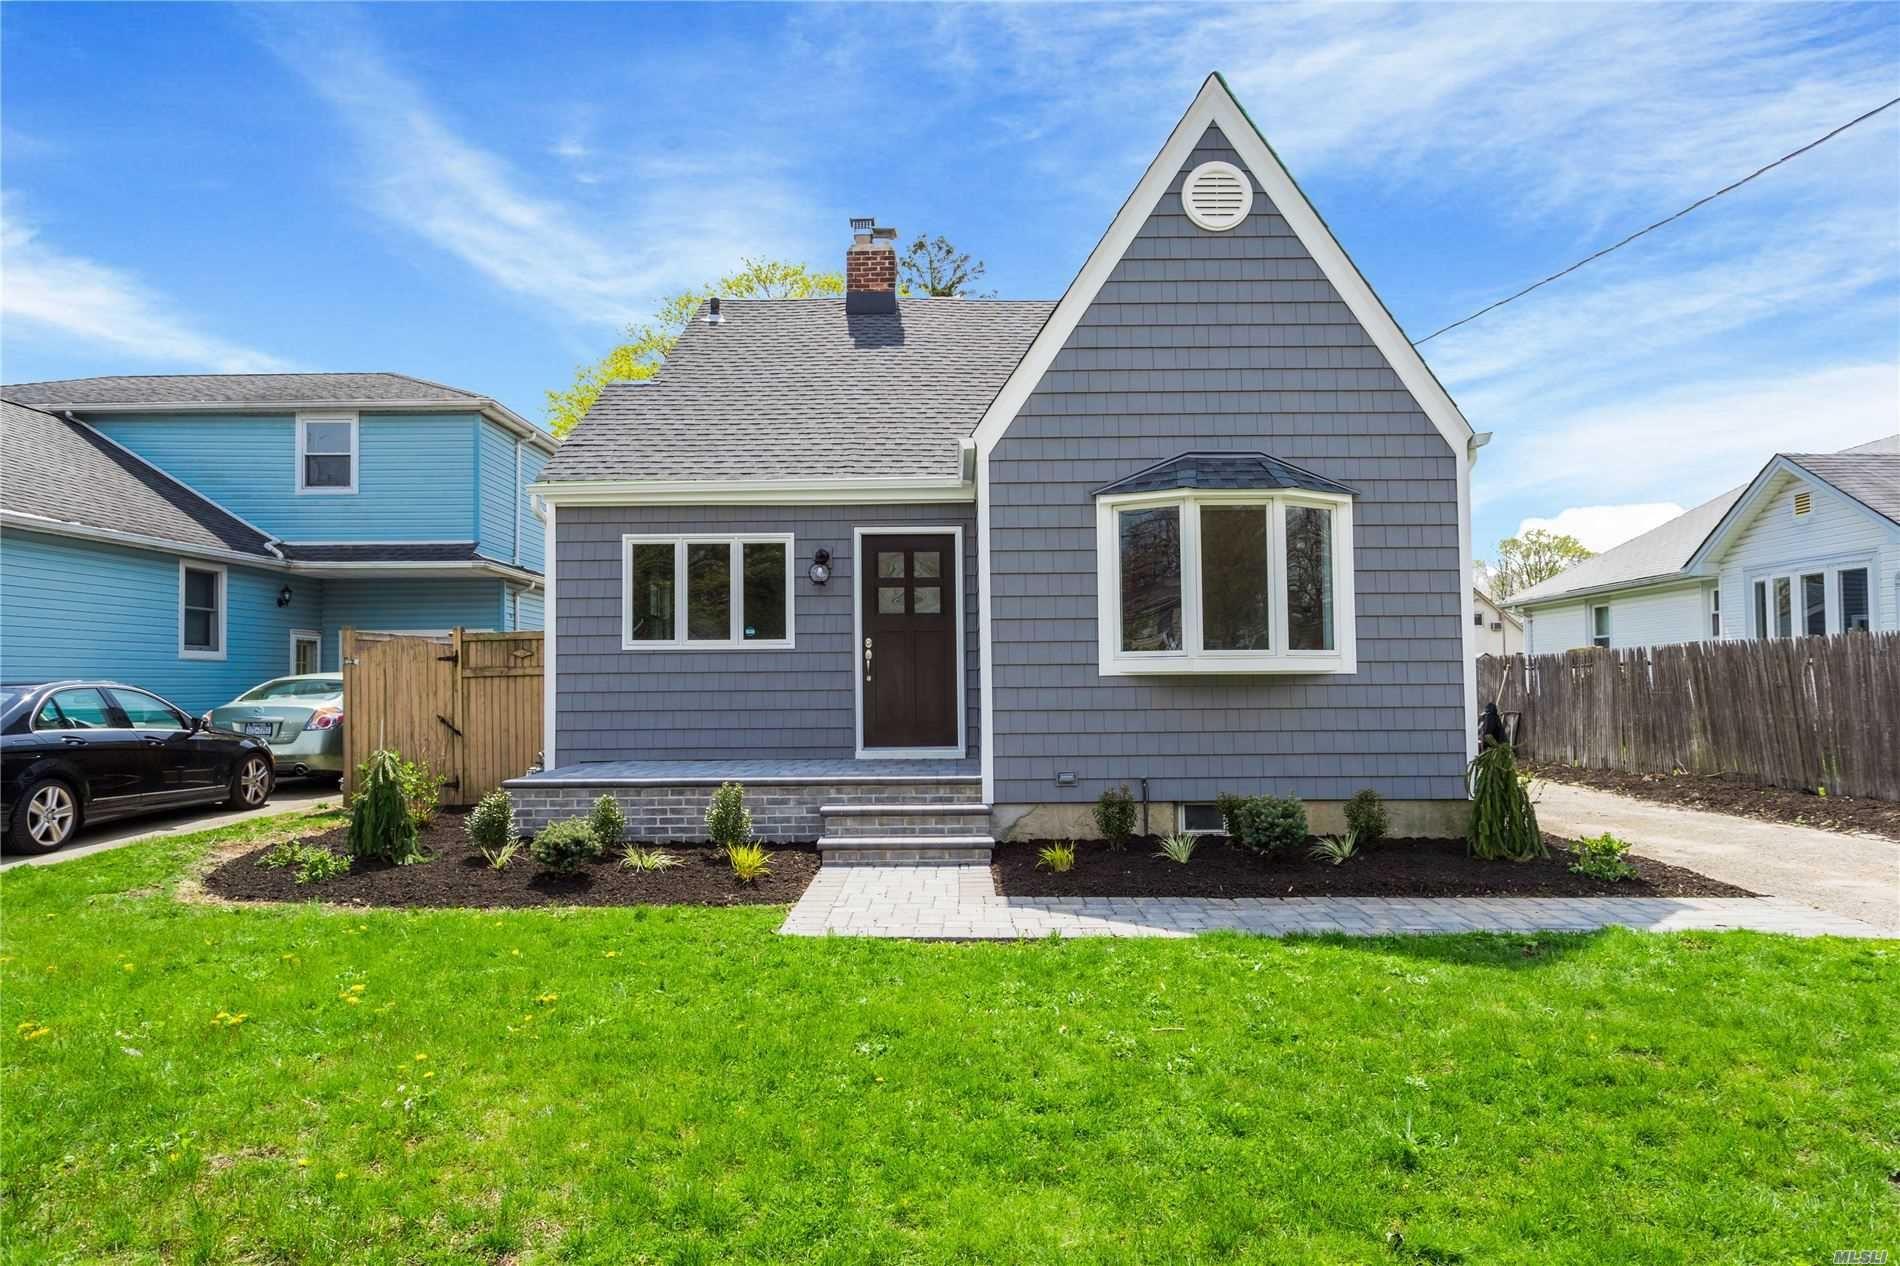 68 Beechwood Street, Farmingdale, NY 11735 - MLS#: 3211886